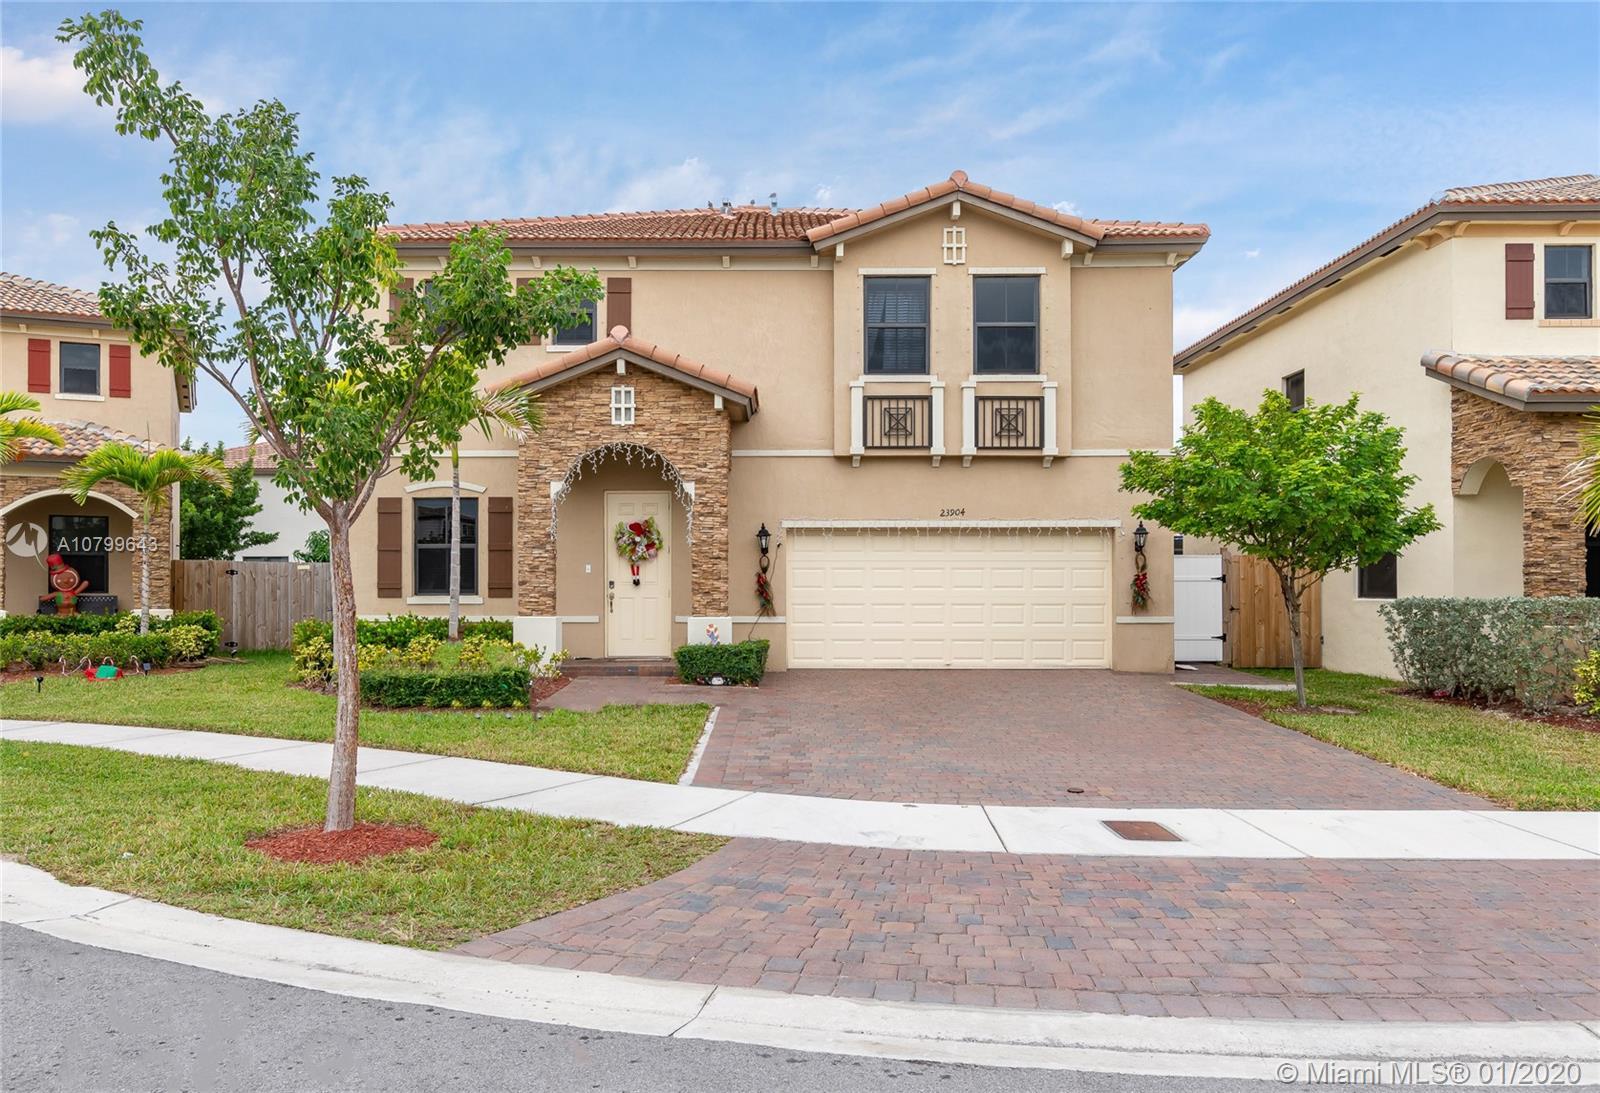 23904 SW 115th Ct, Homestead, FL 33032 - Homestead, FL real estate listing